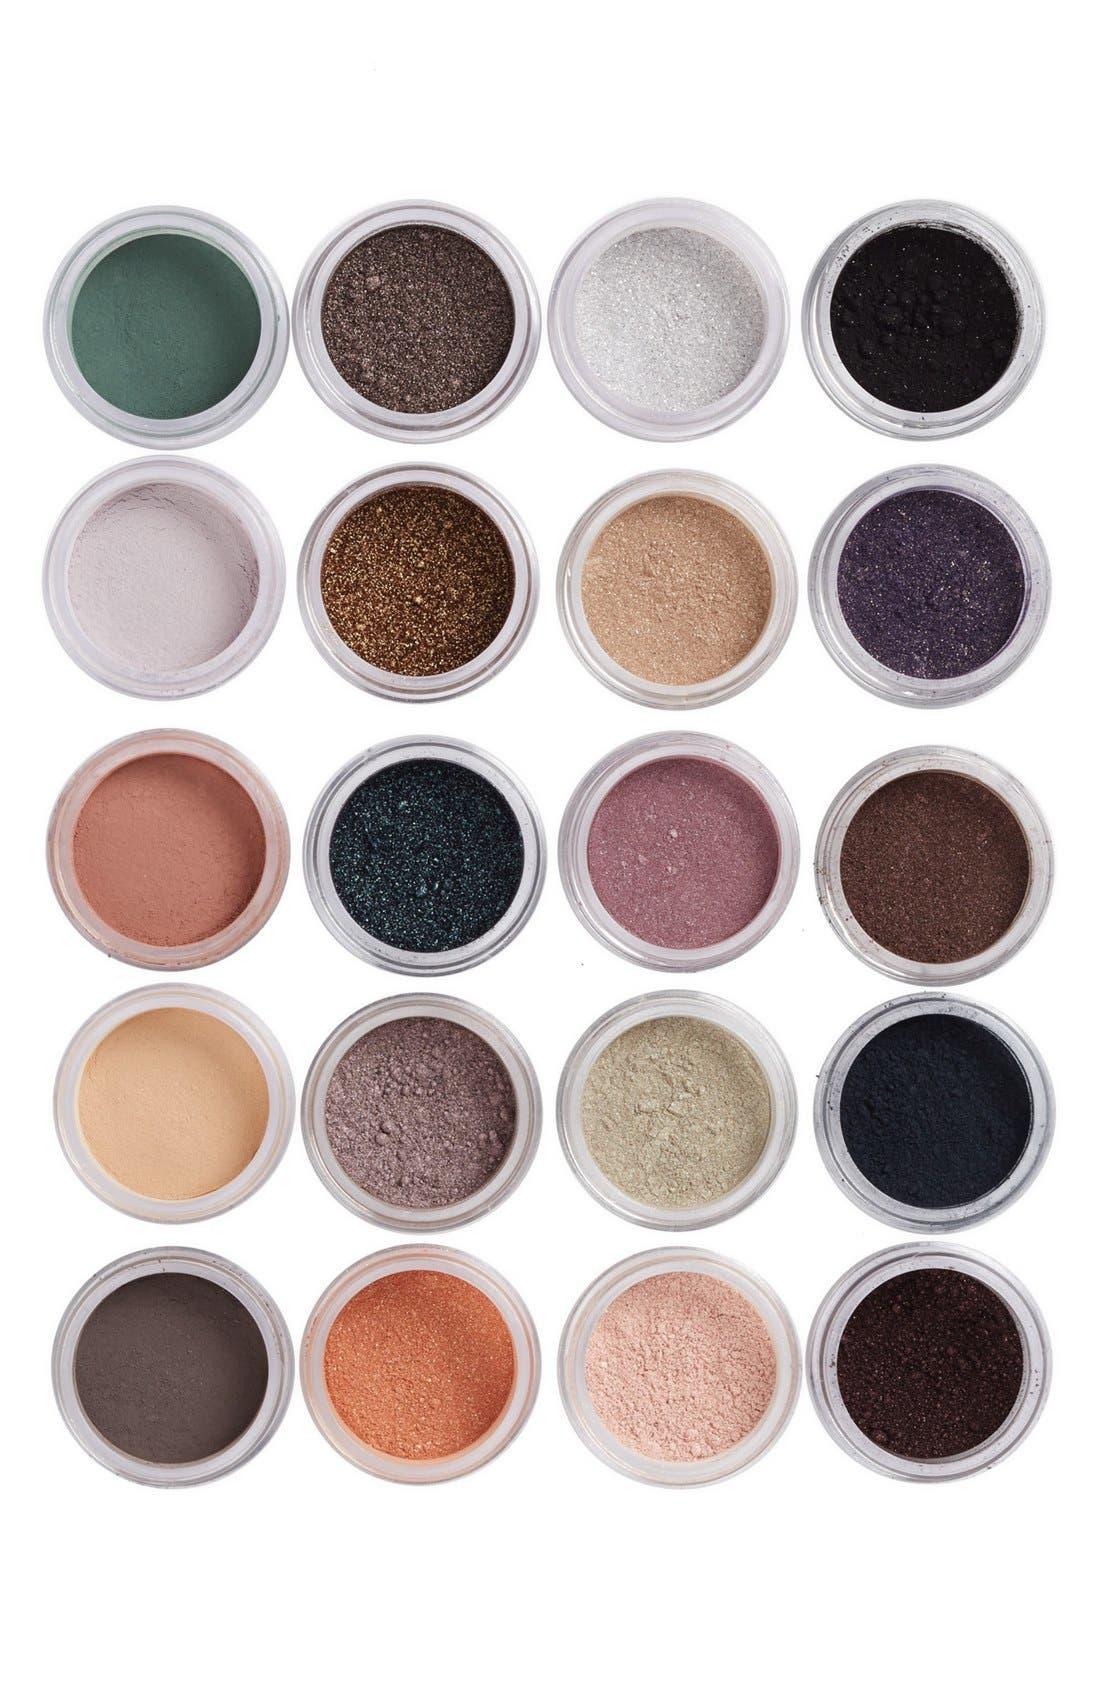 Main Image - bareMinerals® 'Degrees of Dazzling' Eyeshadow Palette ($220 Value)